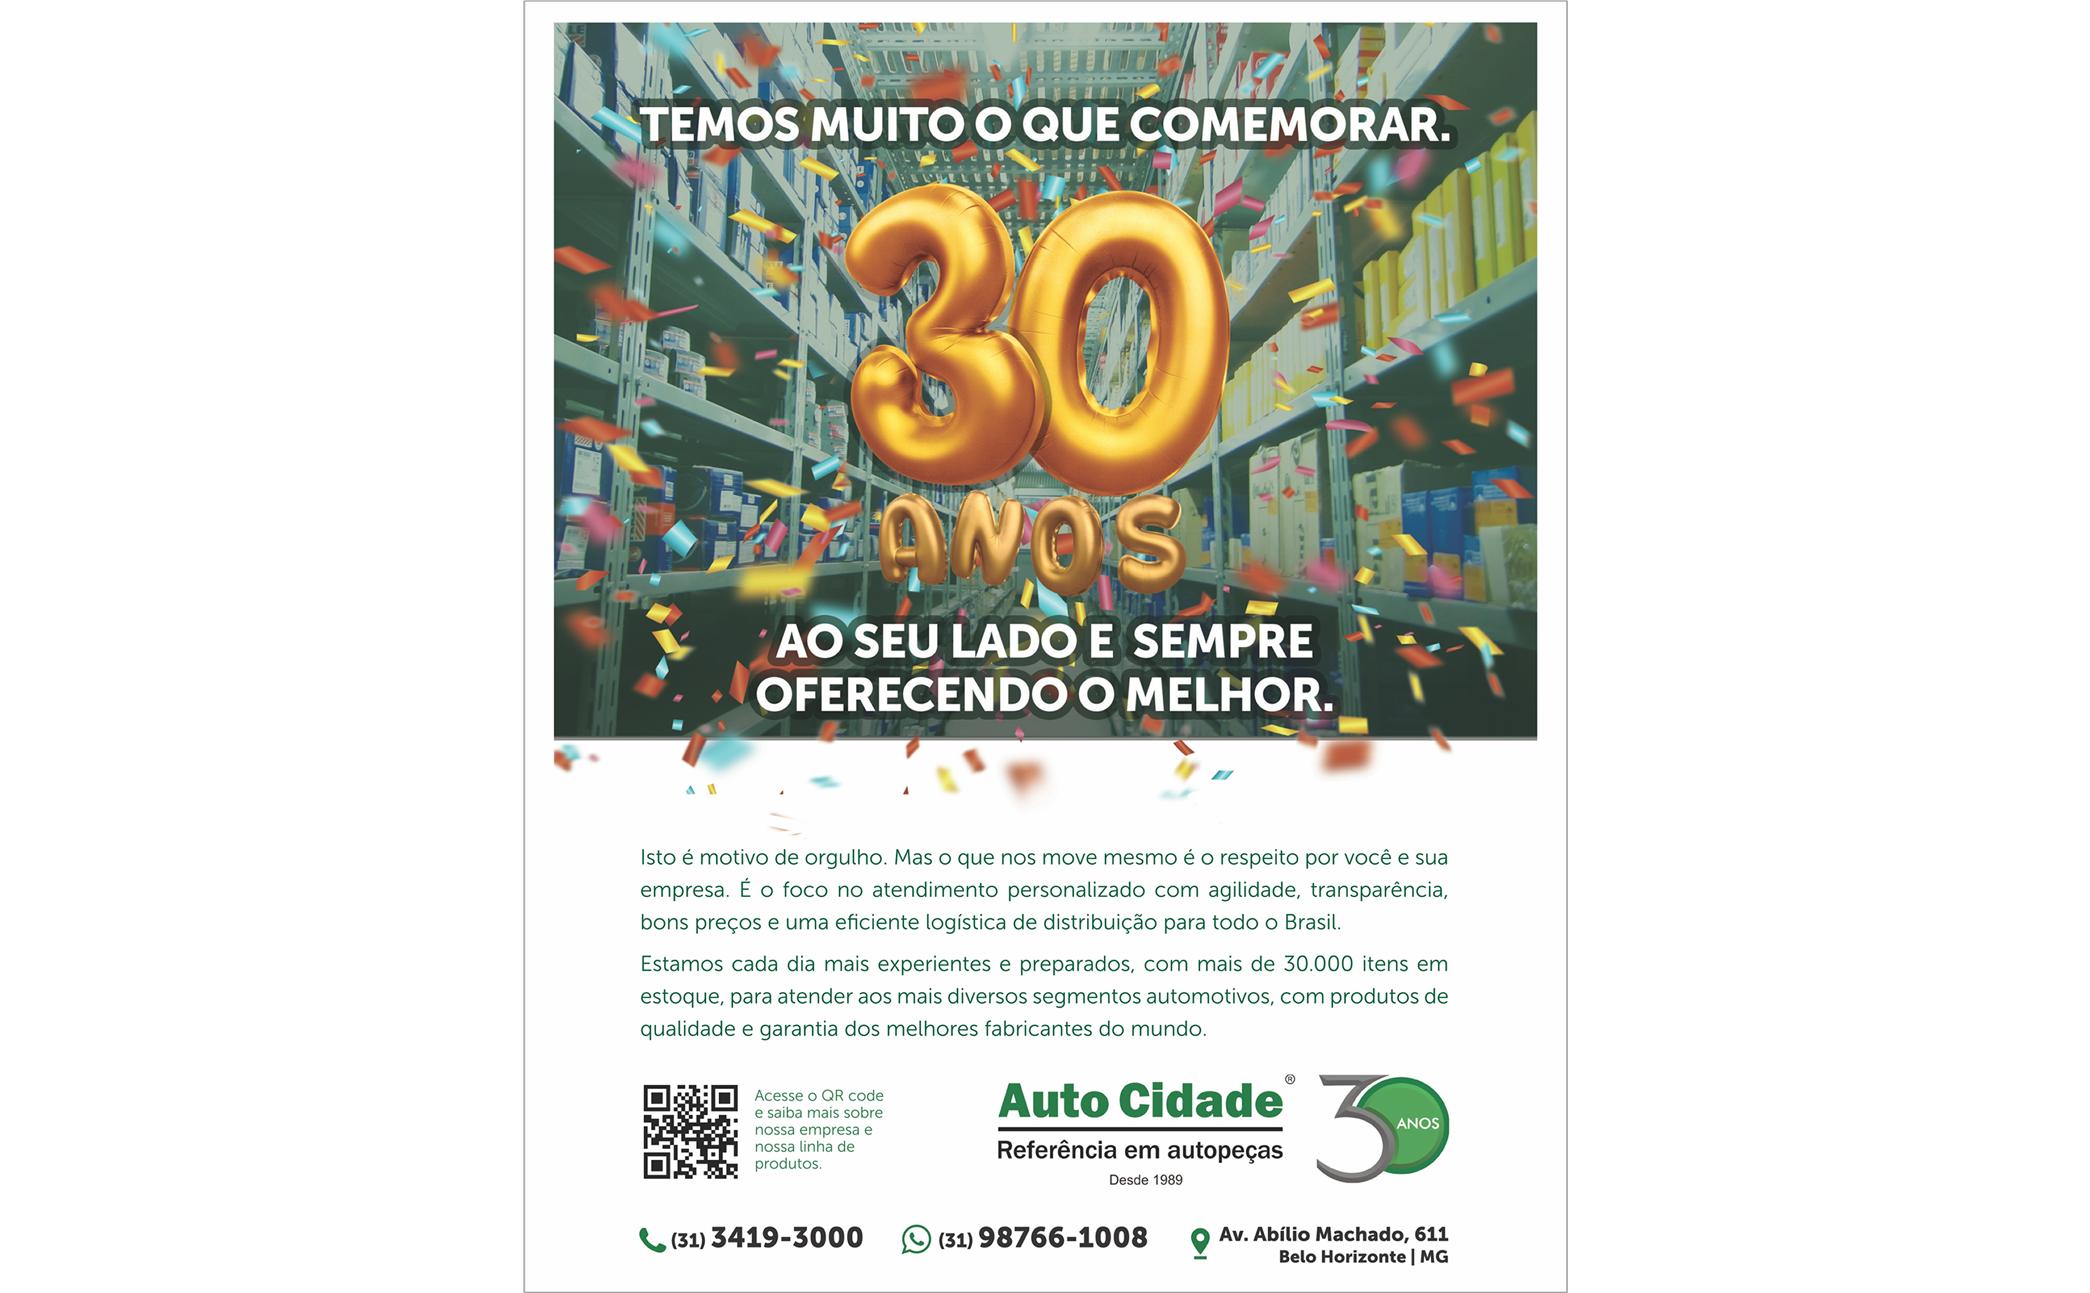 Auto Cidade 30 anos